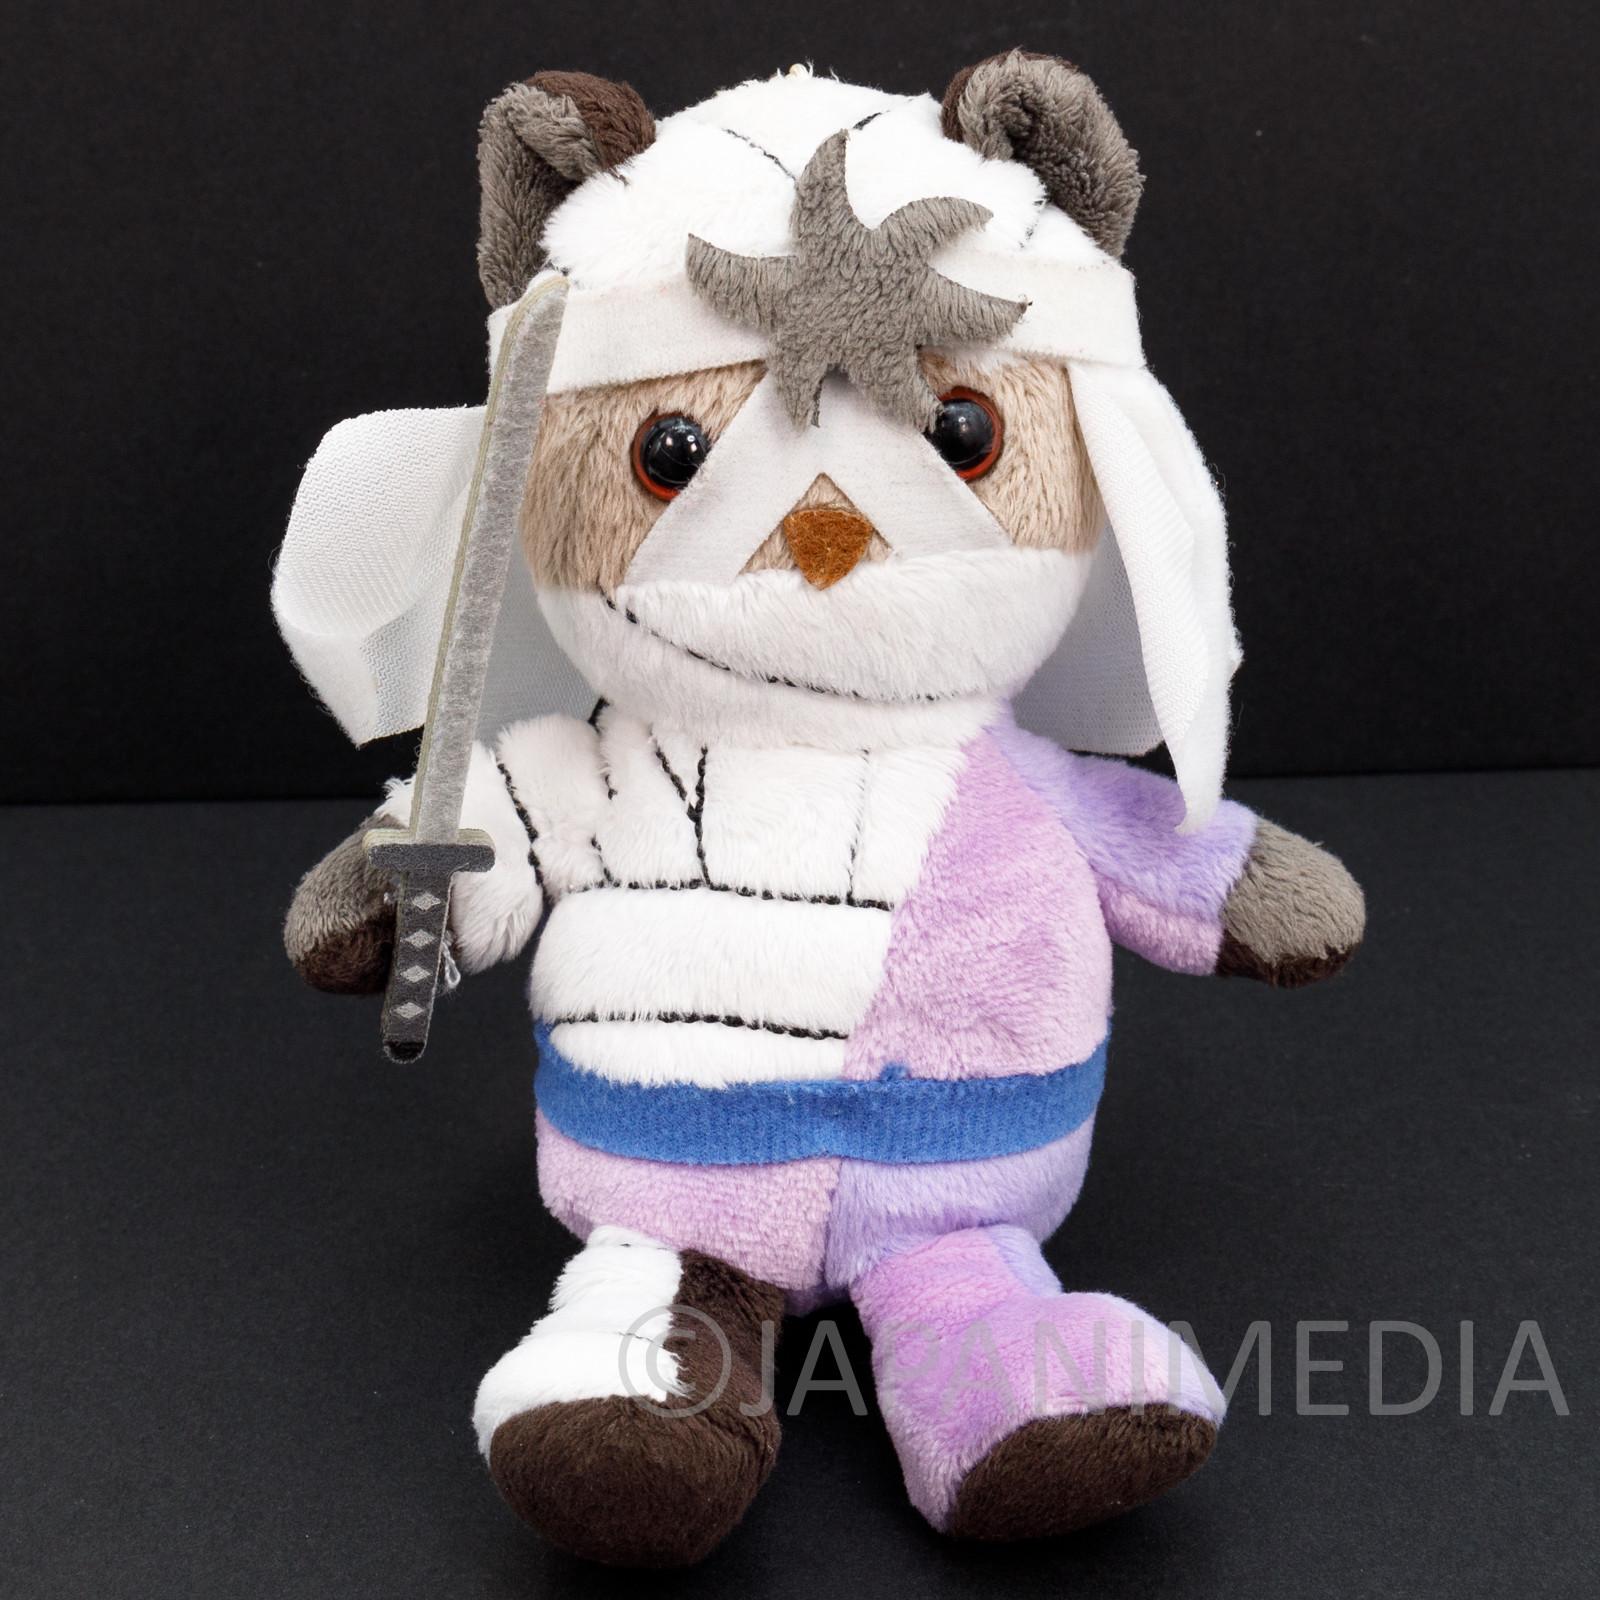 Rurouni Kenshin Shishio Makoto Bear Mascot Plush Doll Ballchain JAPAN